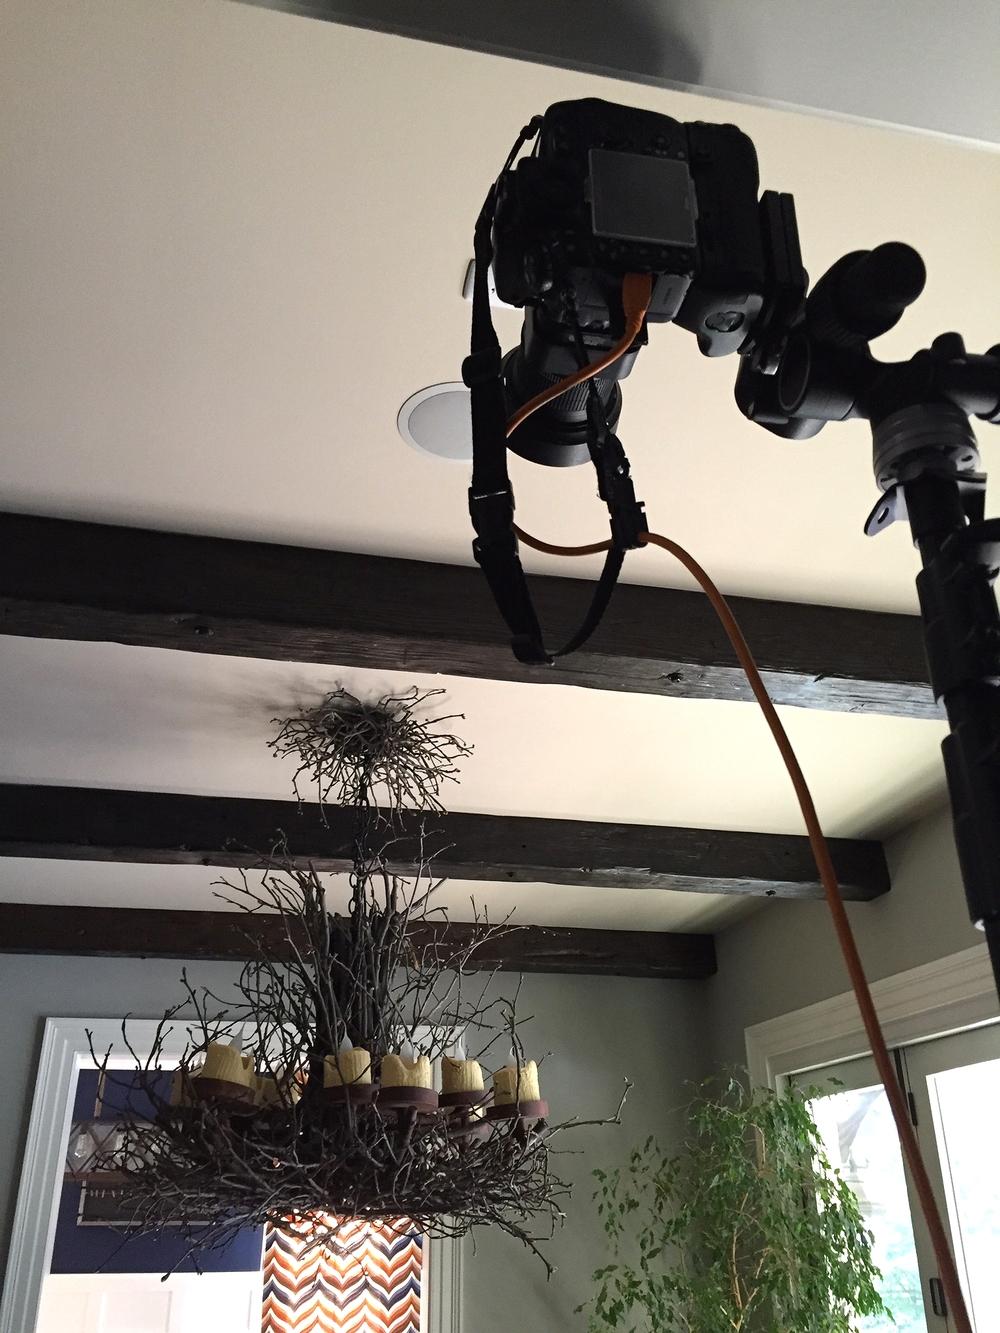 Camera mounted on a 24' camera stand